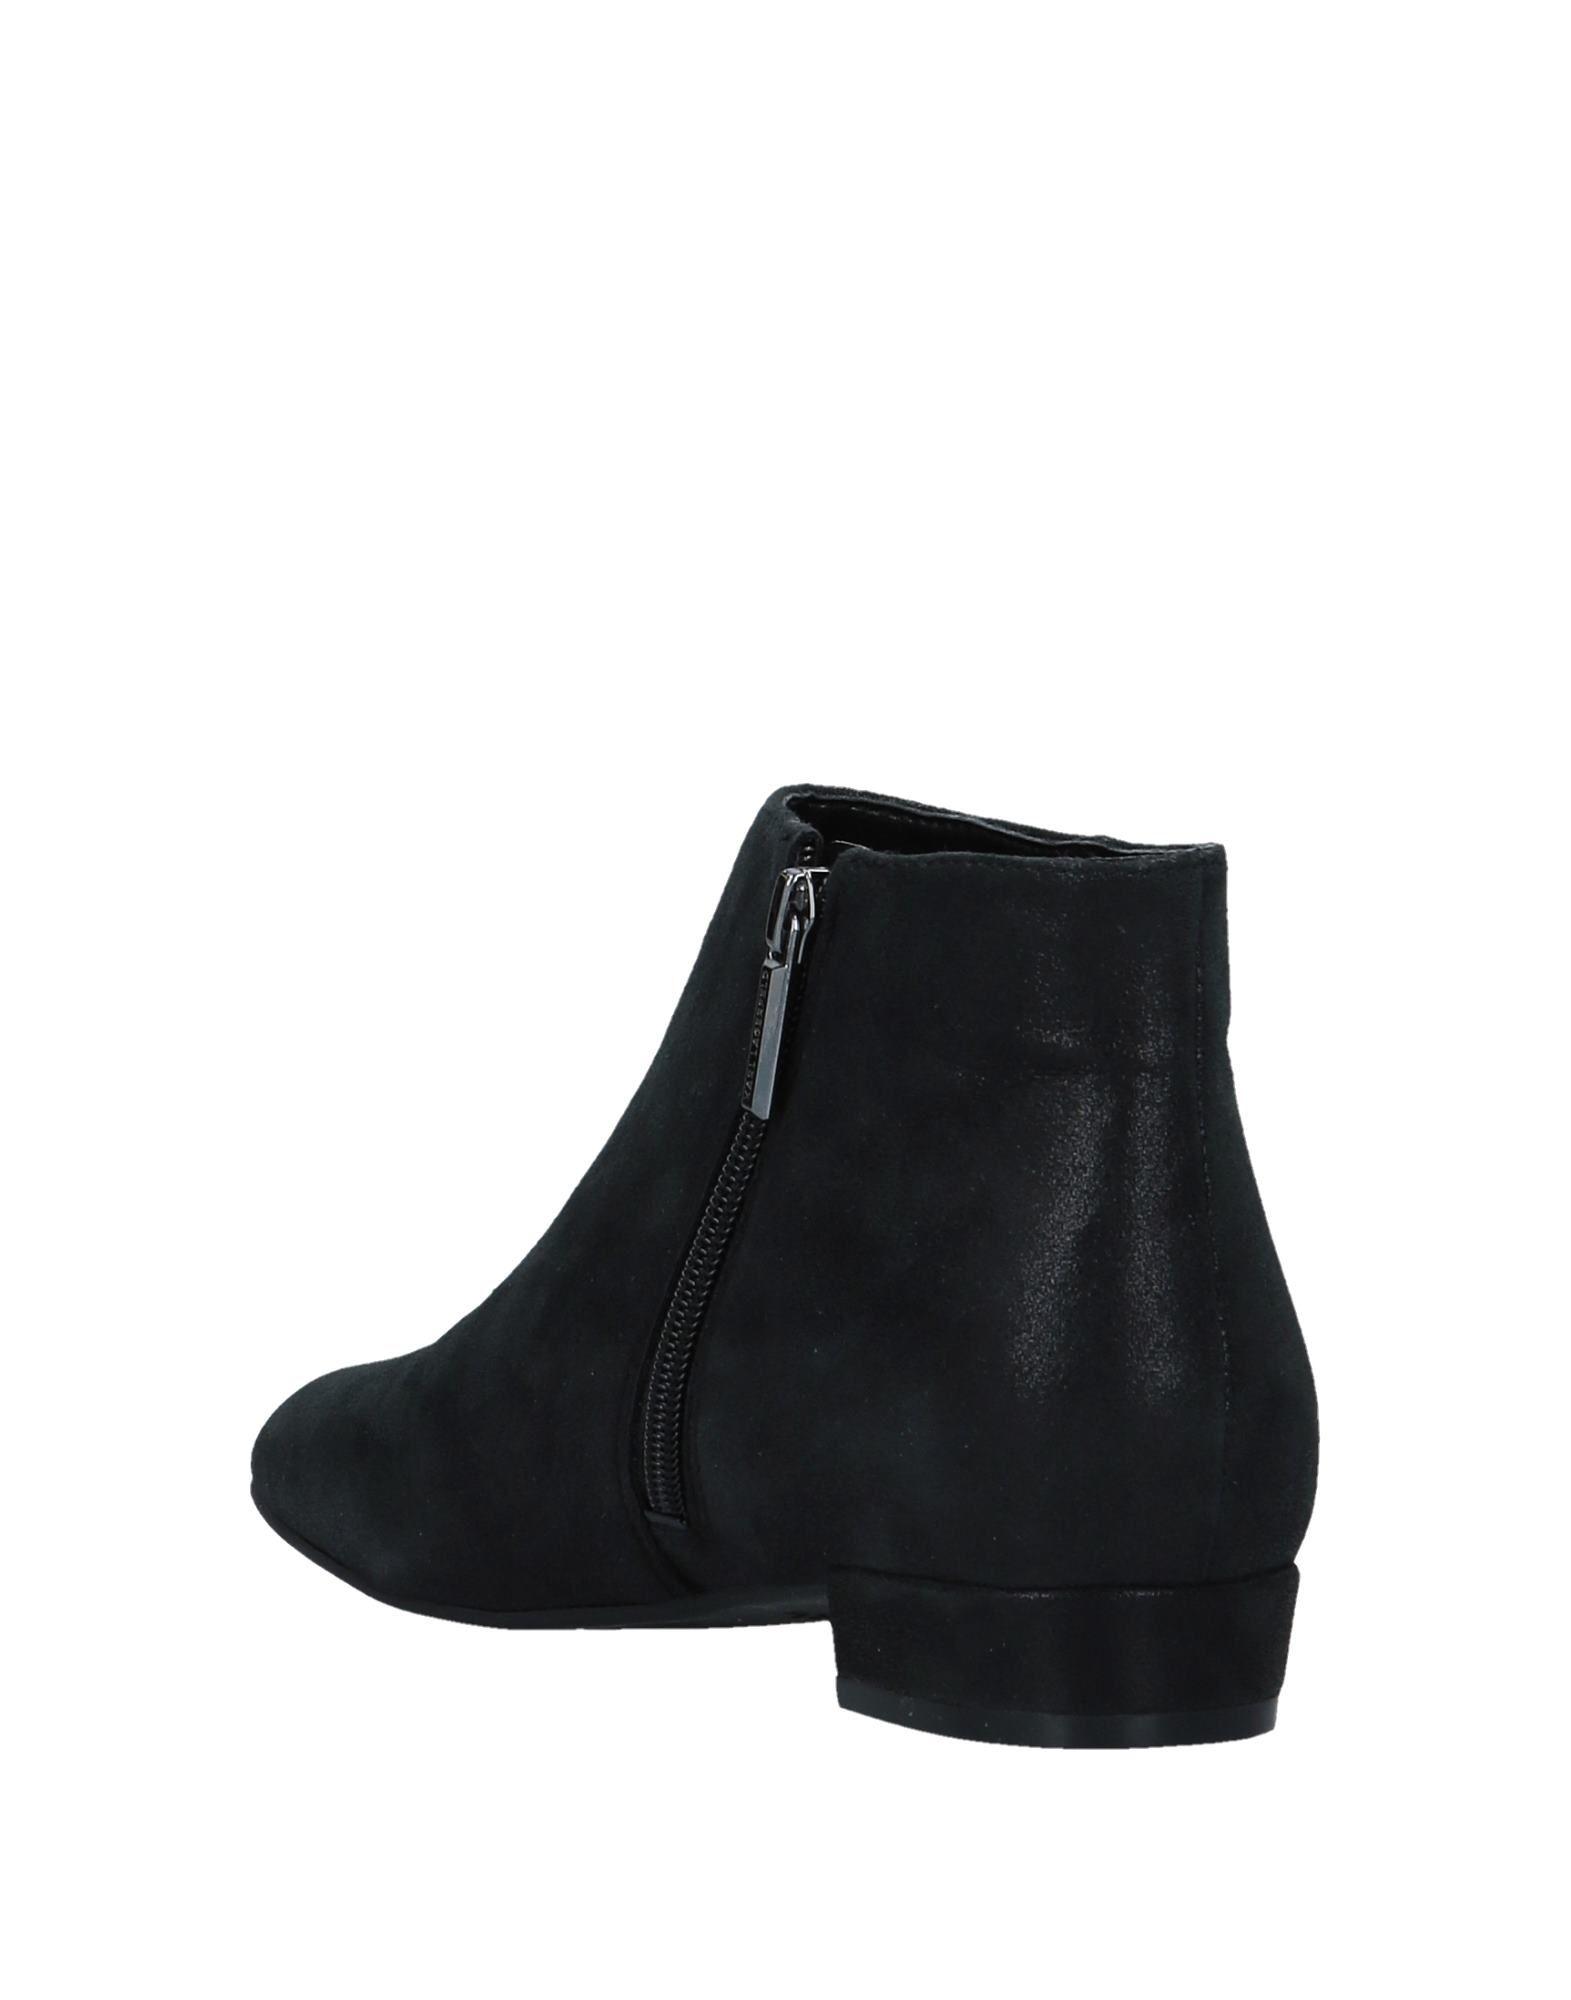 Stilvolle billige Schuhe Damen Karl Lagerfeld Stiefelette Damen Schuhe  11542578HU 277385